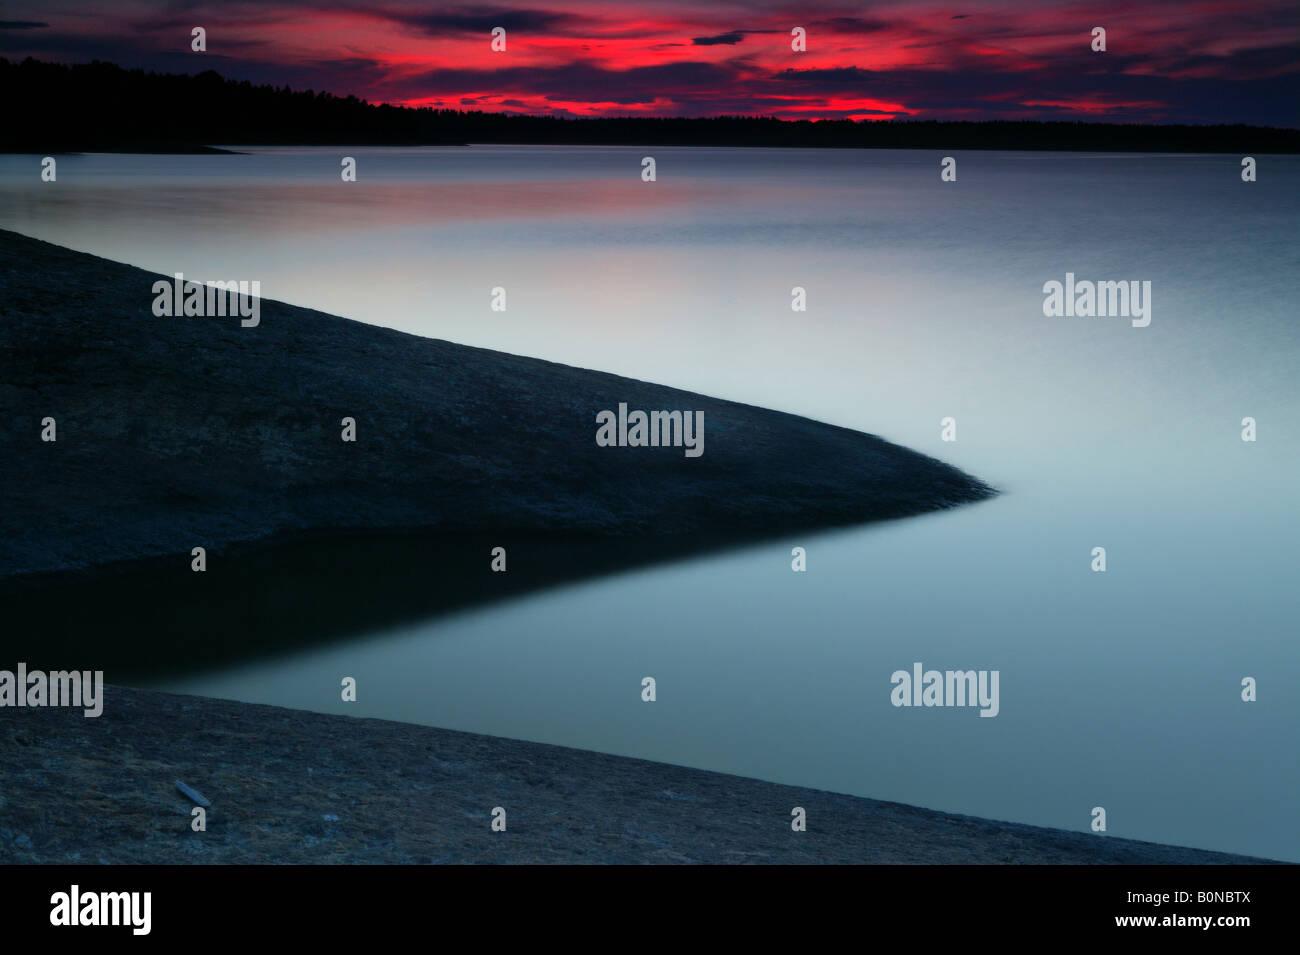 Spring sunset at the island Østenrødøya in the lake Vansjø, Østfold, Norway. Vansjø - Stock Image